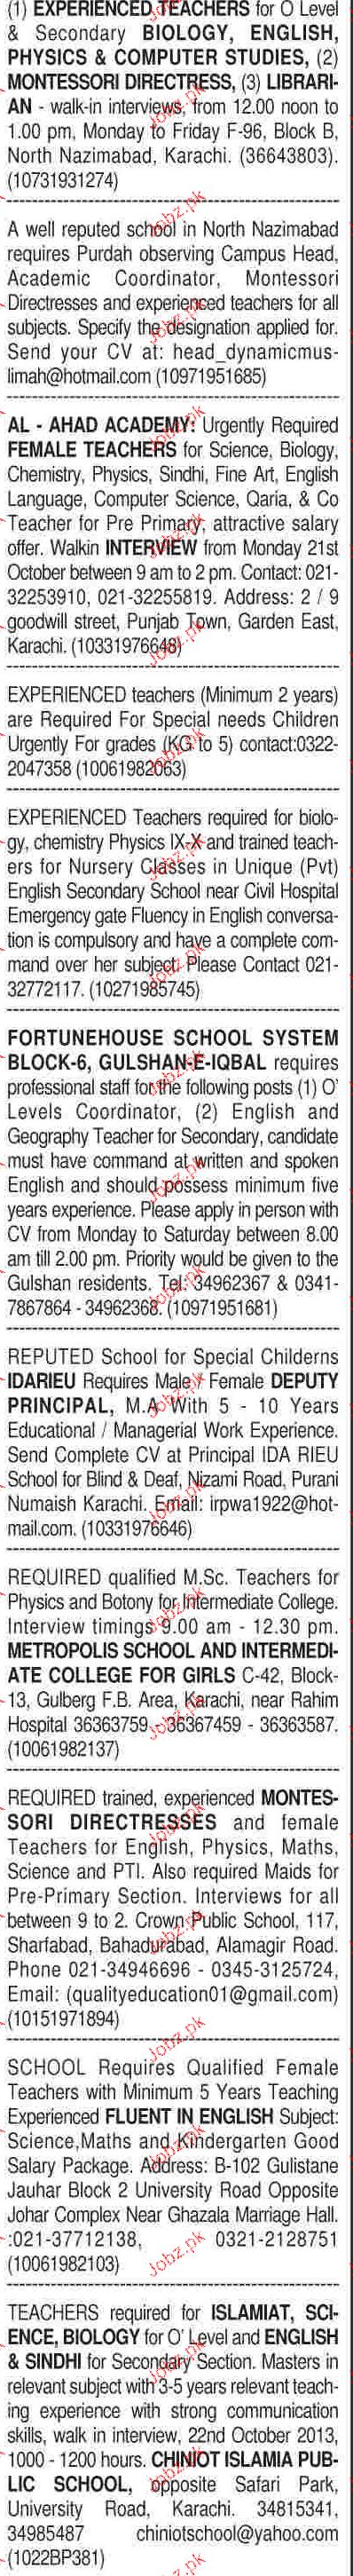 sunday dawn classified teaching staff job opportunity 2017 jobs sunday dawn classified teaching staff job opportunity